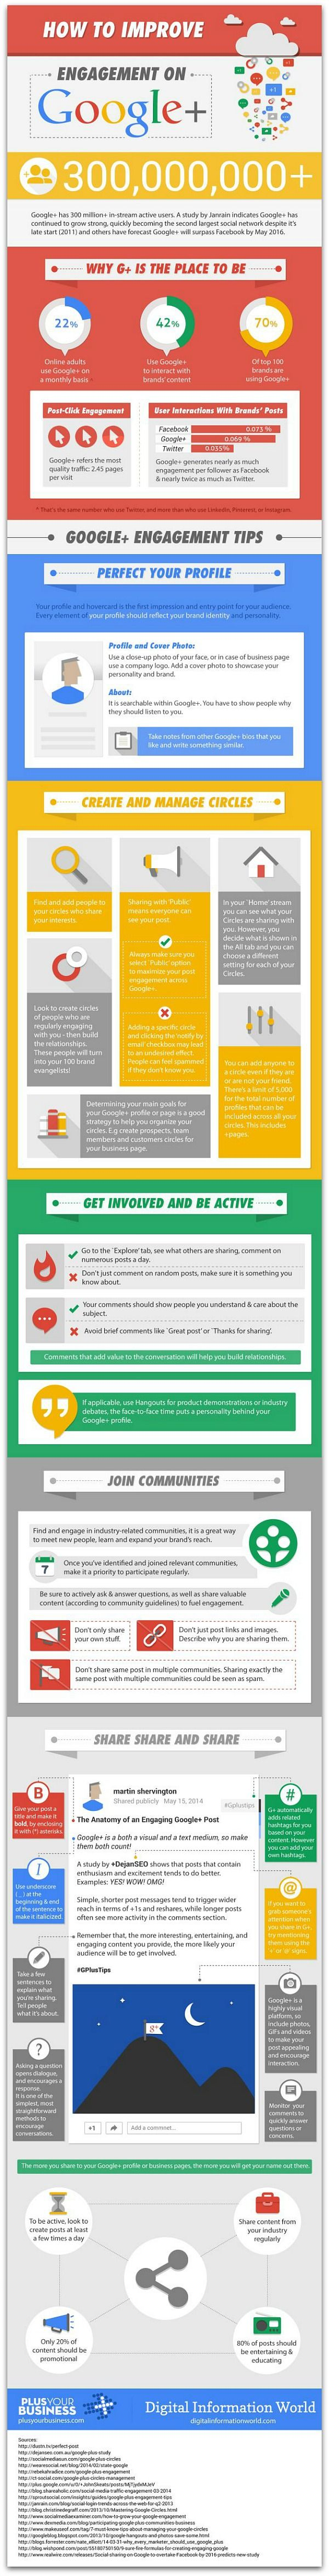 5 ways to increase engagement on Google+ #Infographic | via #BornToBeSocial - Pinterest Marketing